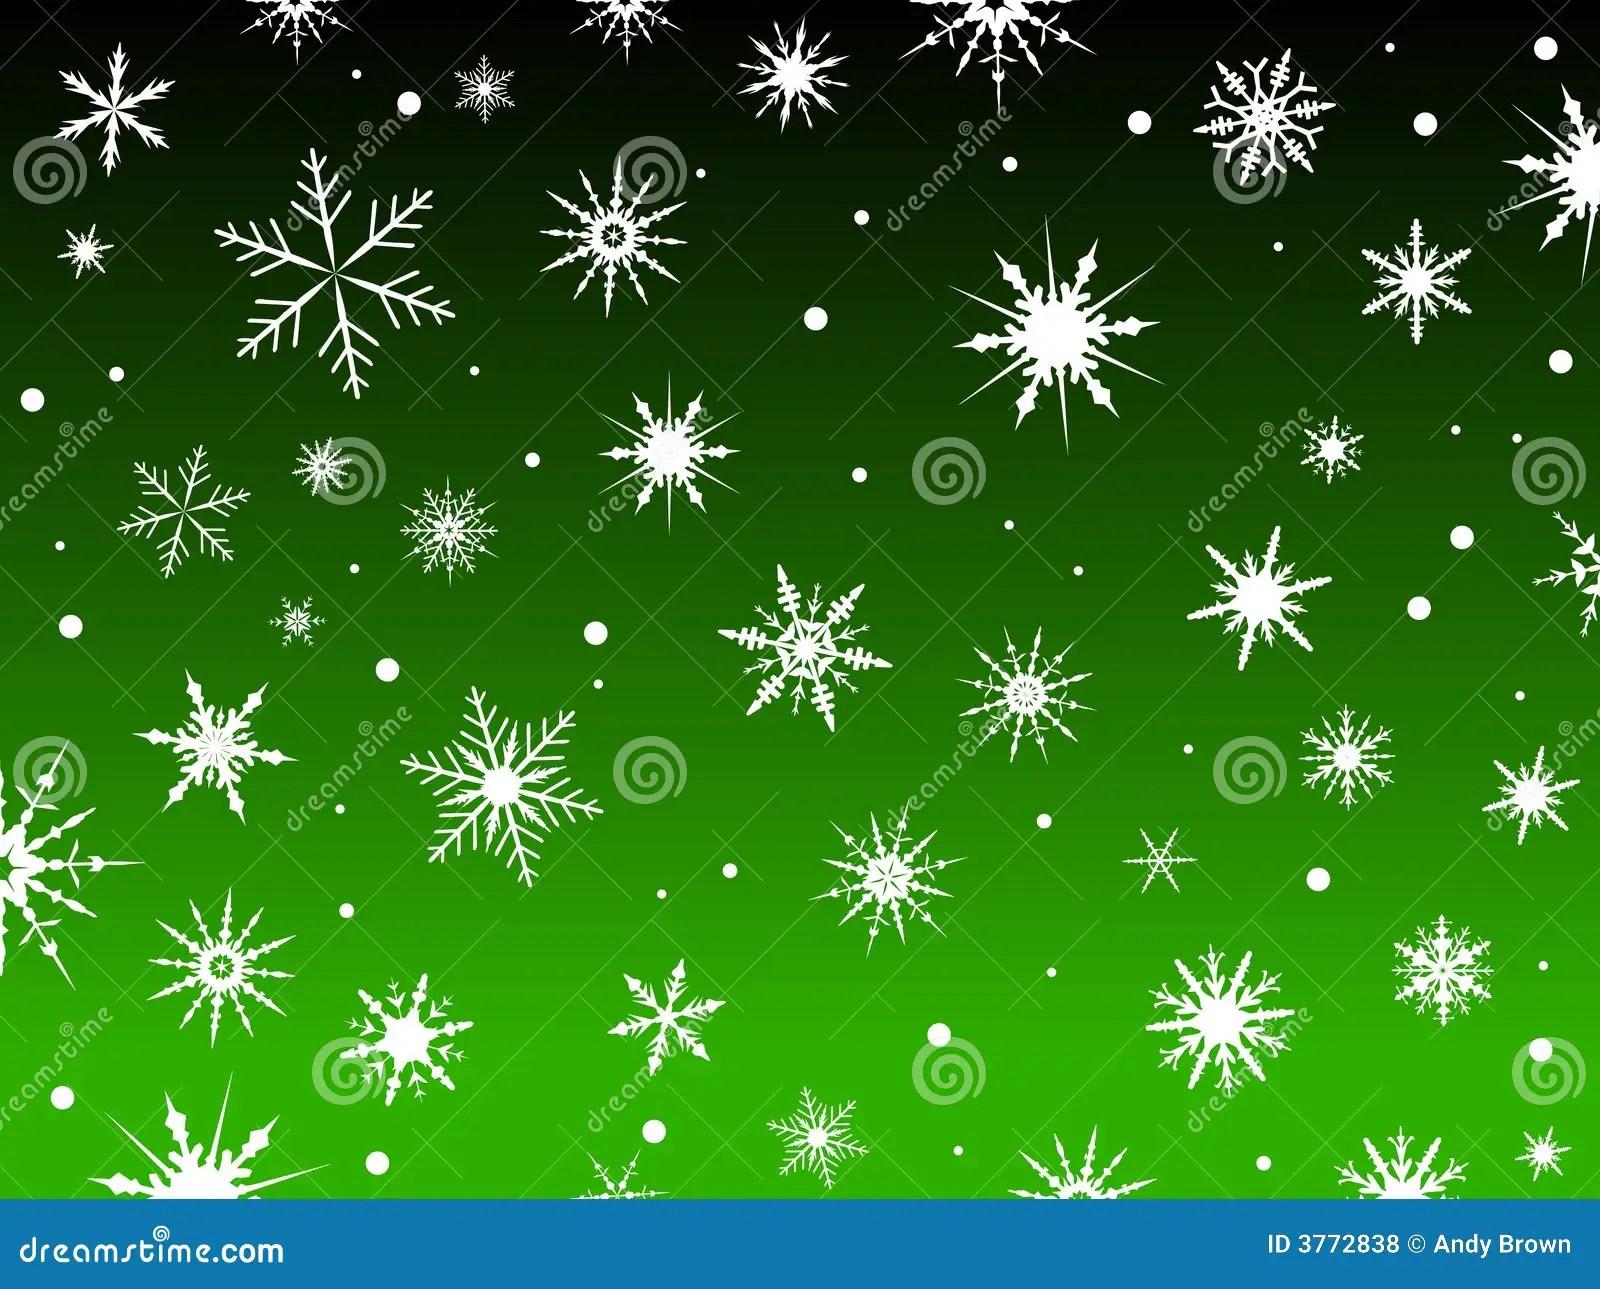 Falling Snow Desktop Wallpaper Snow Border Green Stock Vector Illustration Of Christmas